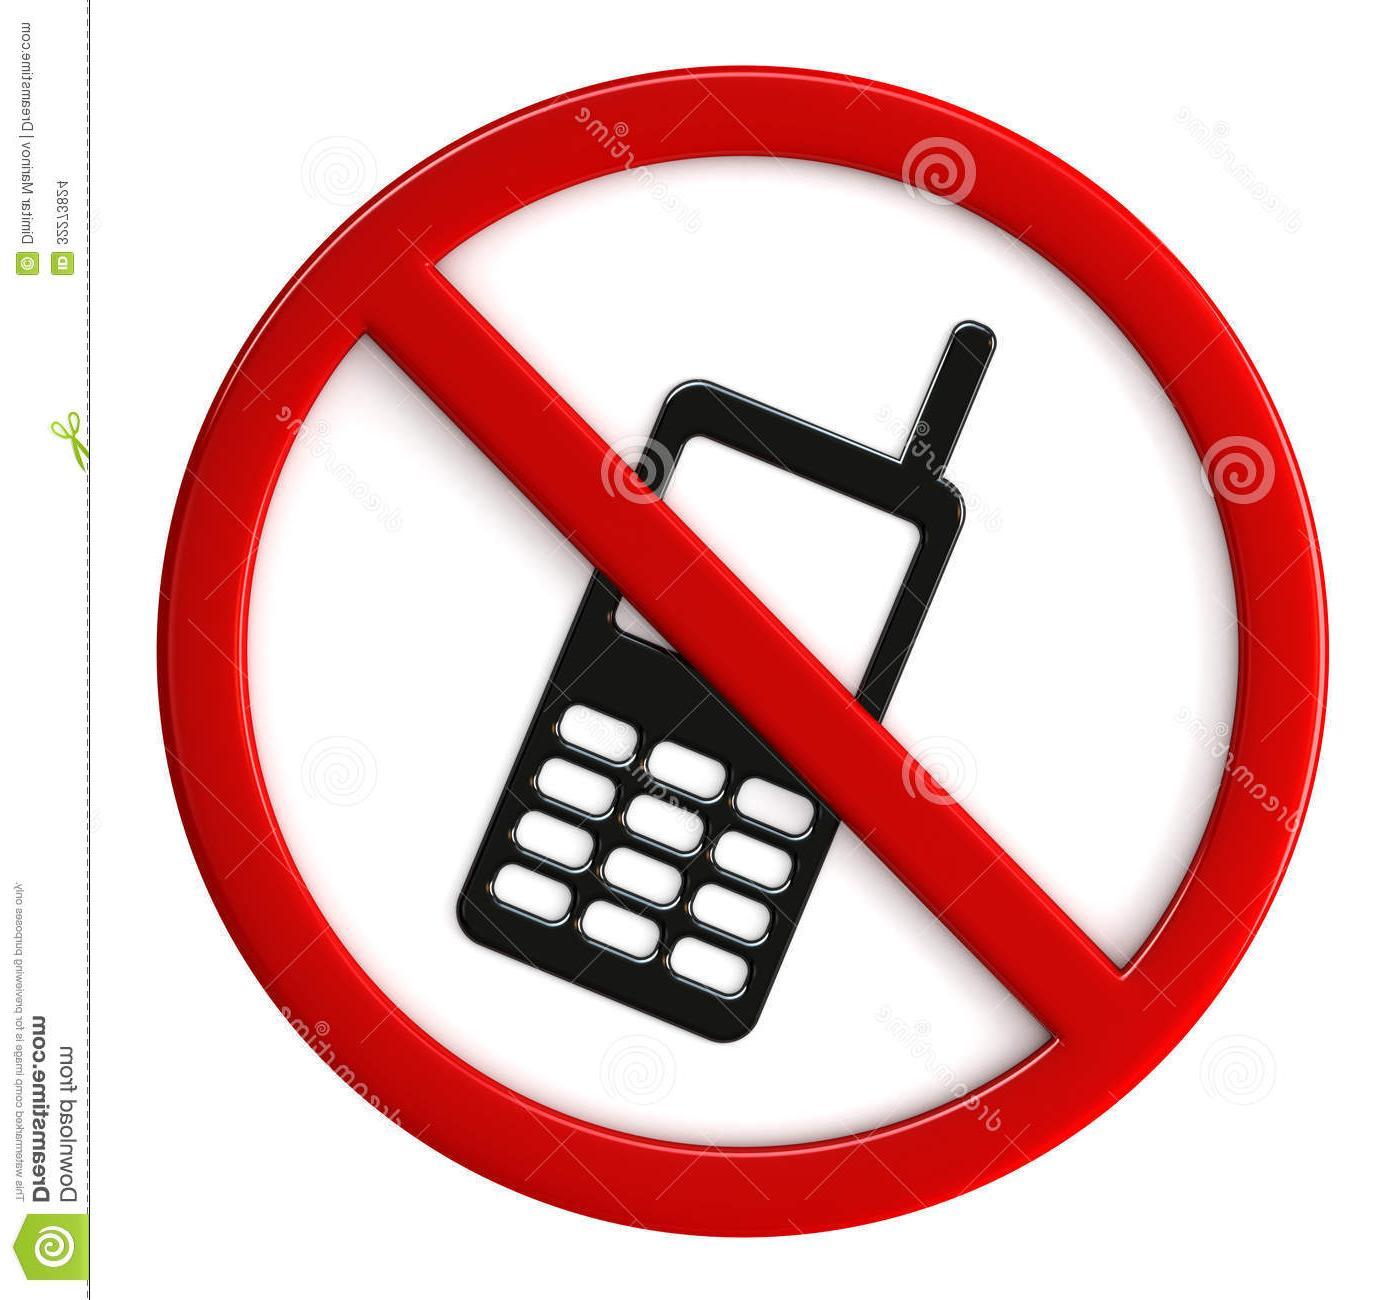 No Phone Sign.